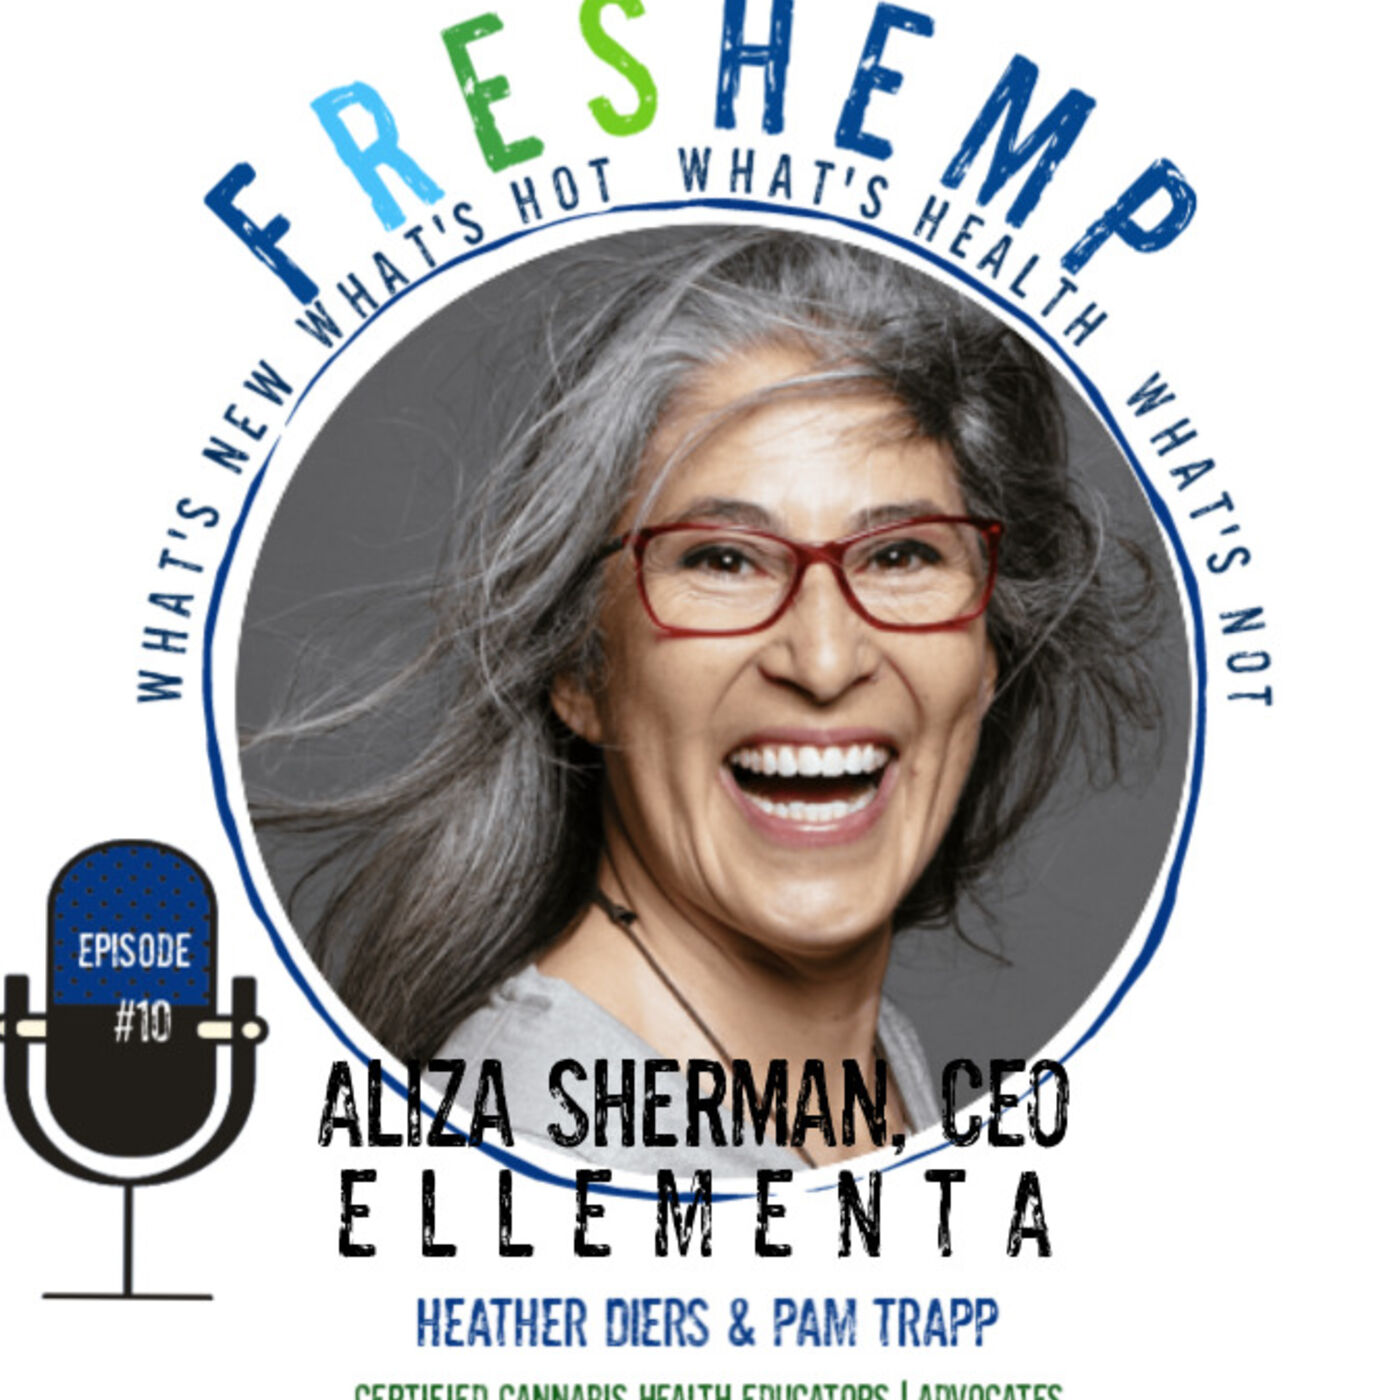 Aliza Sherman - Women Driving the Cannabis Health Revolution